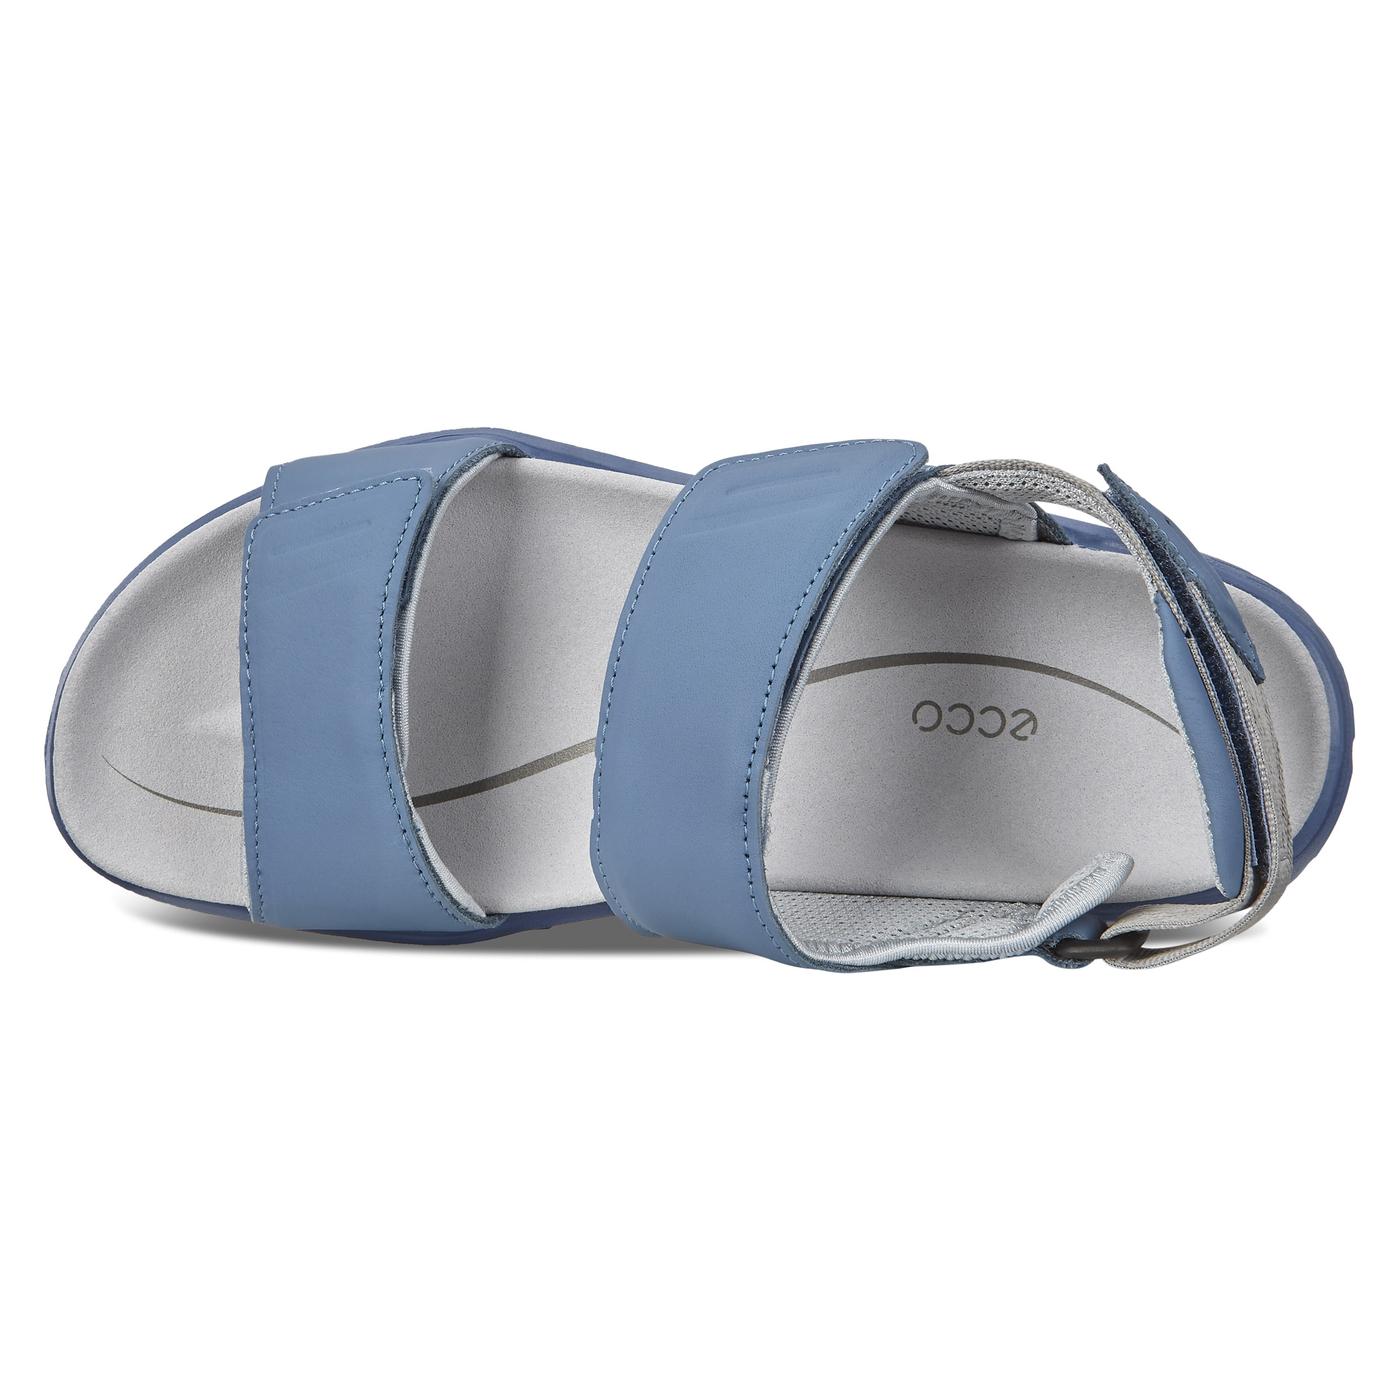 ECCO X-TRINSIC Womens Flat Sandal Leather Strap